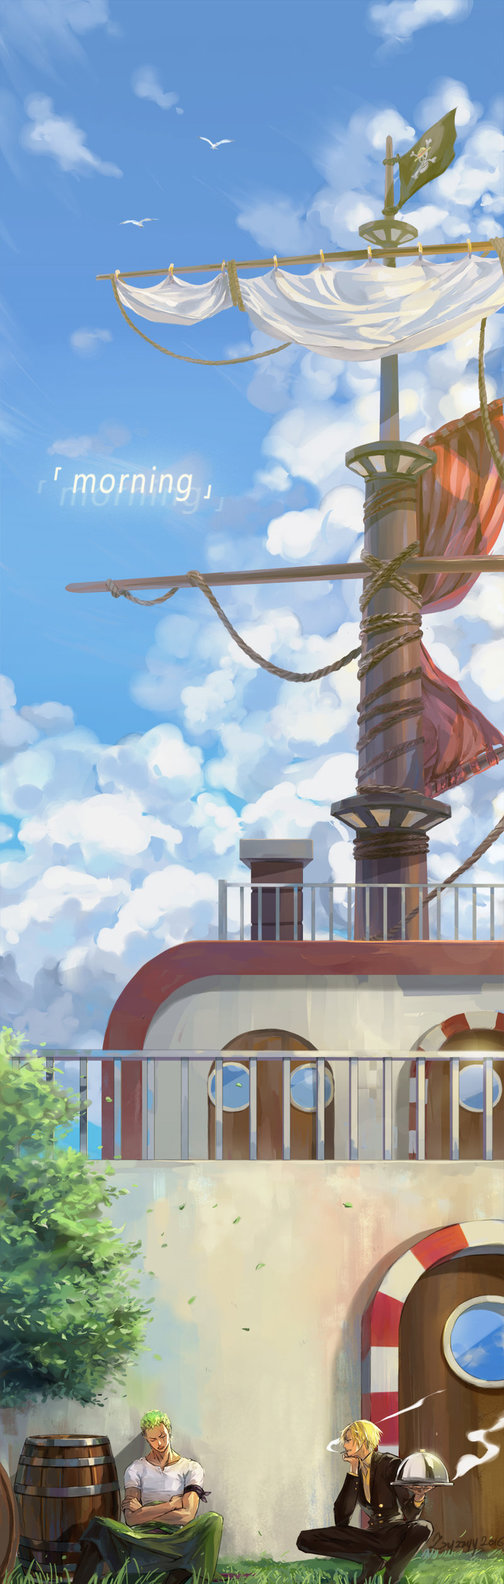 One Piece Thousand Sunny OP_morning by zzyzzyy on DeviantArt